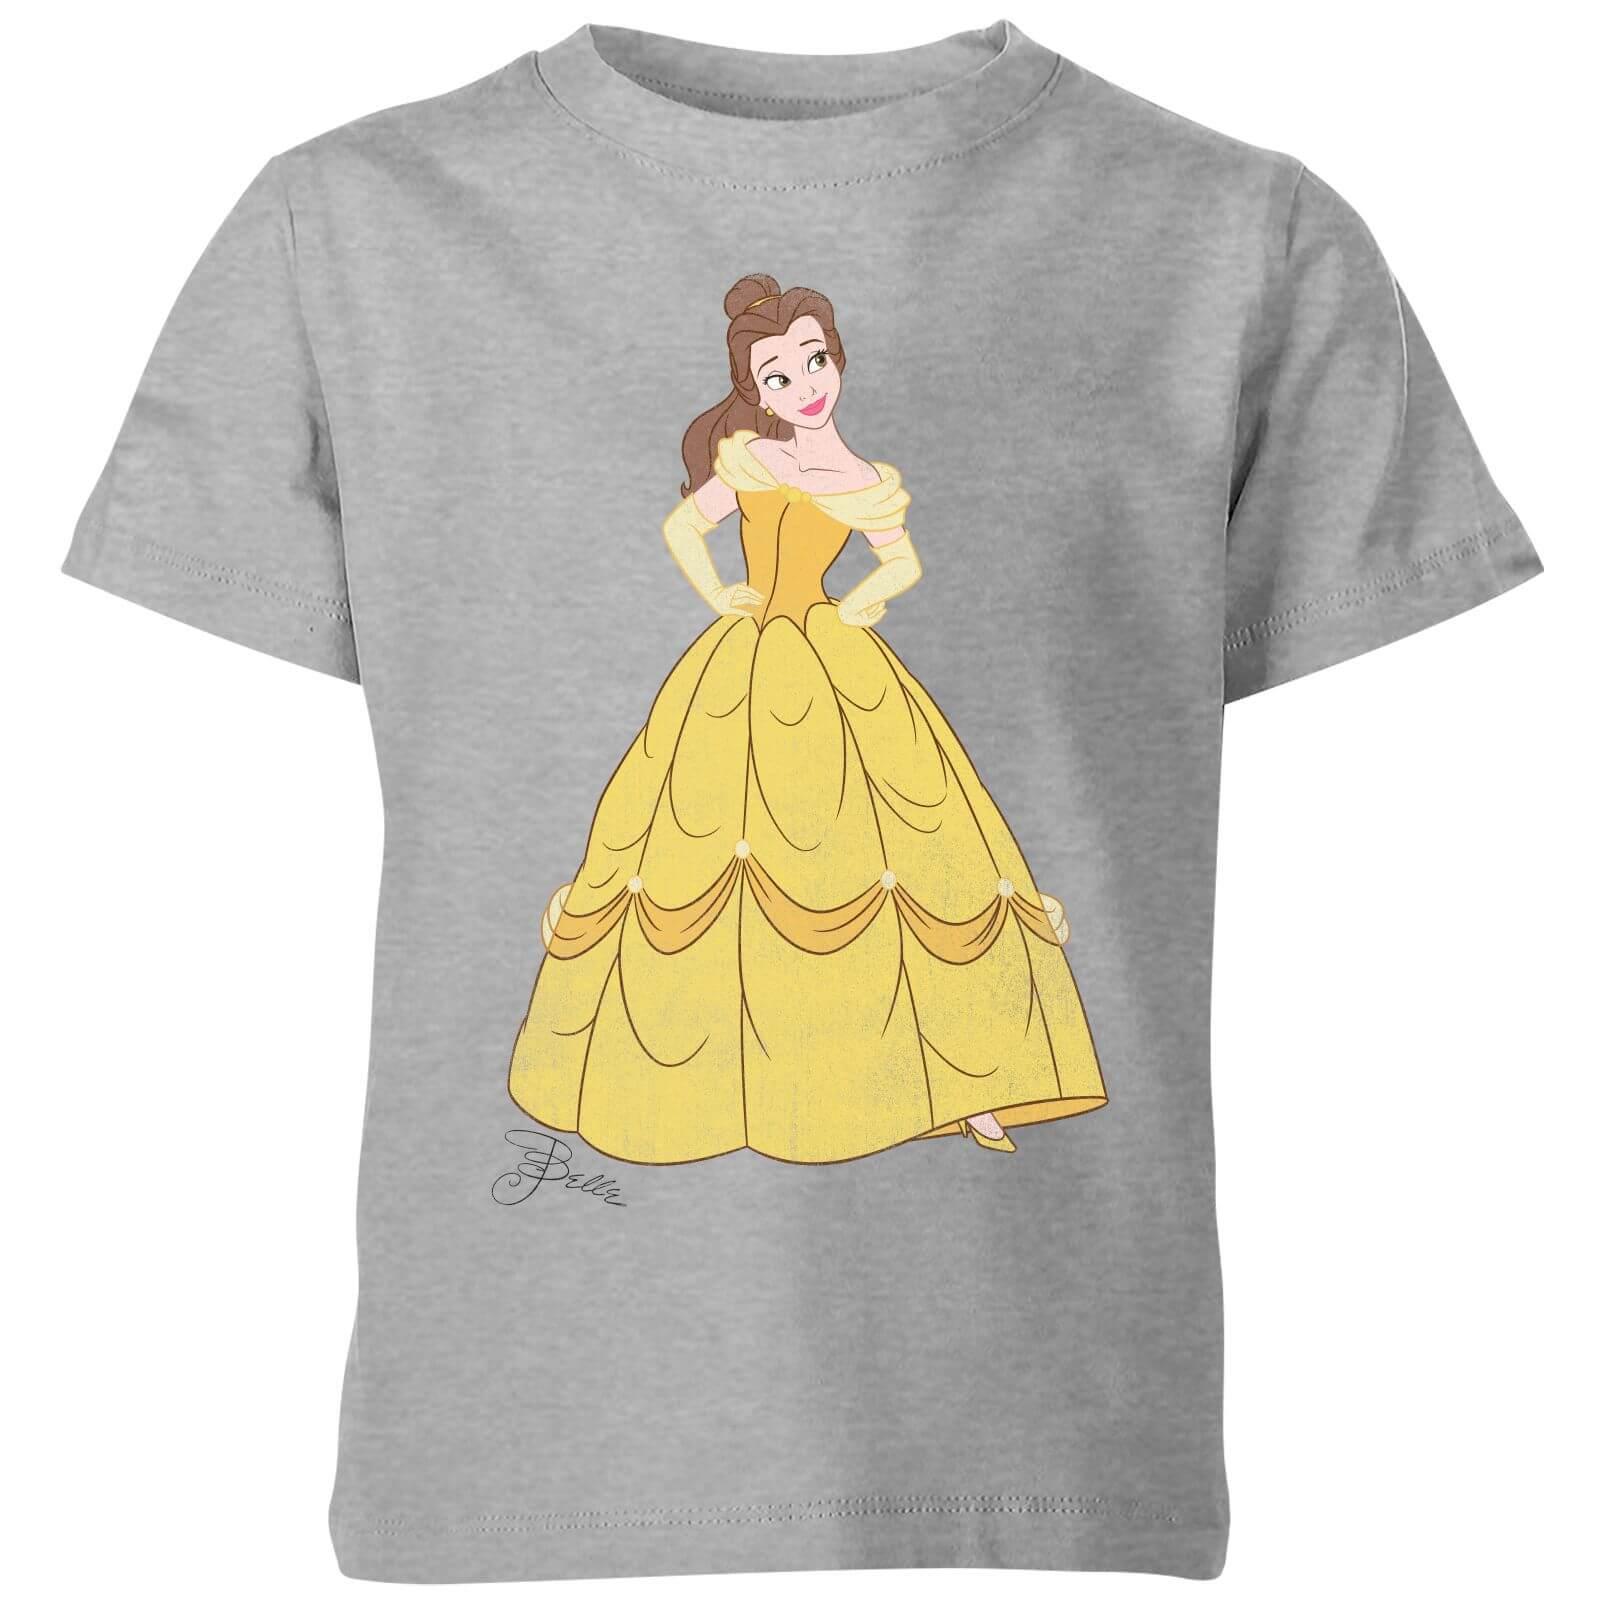 disney princess belle classic kids' t-shirt - grey - 3-4 years - grey